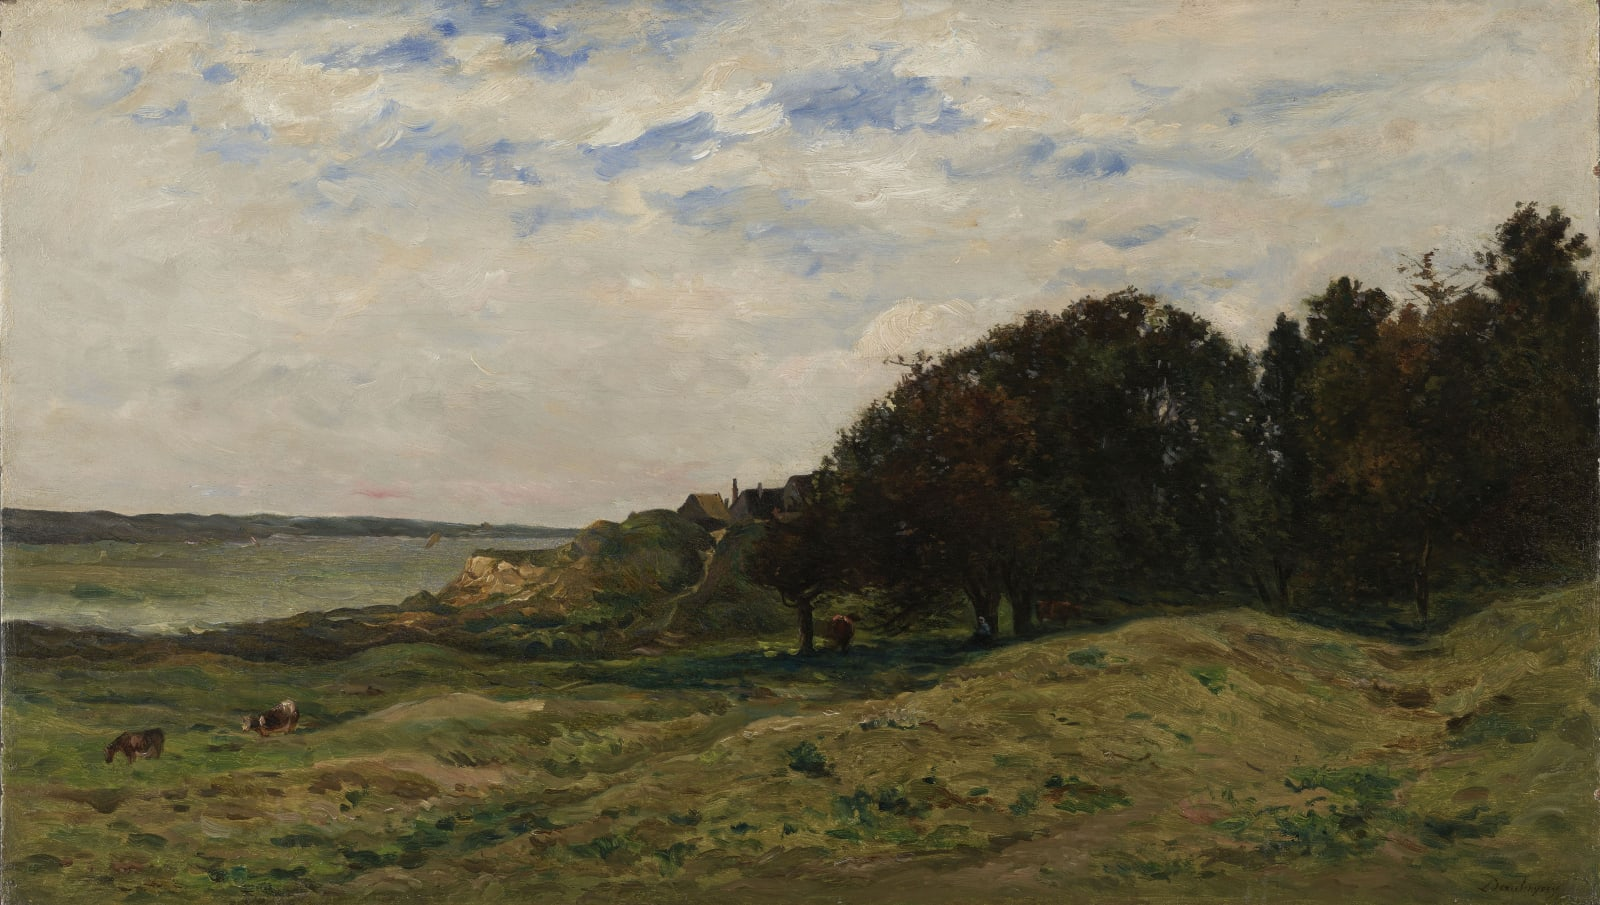 Charles François Daubigny, Villerville, 1874